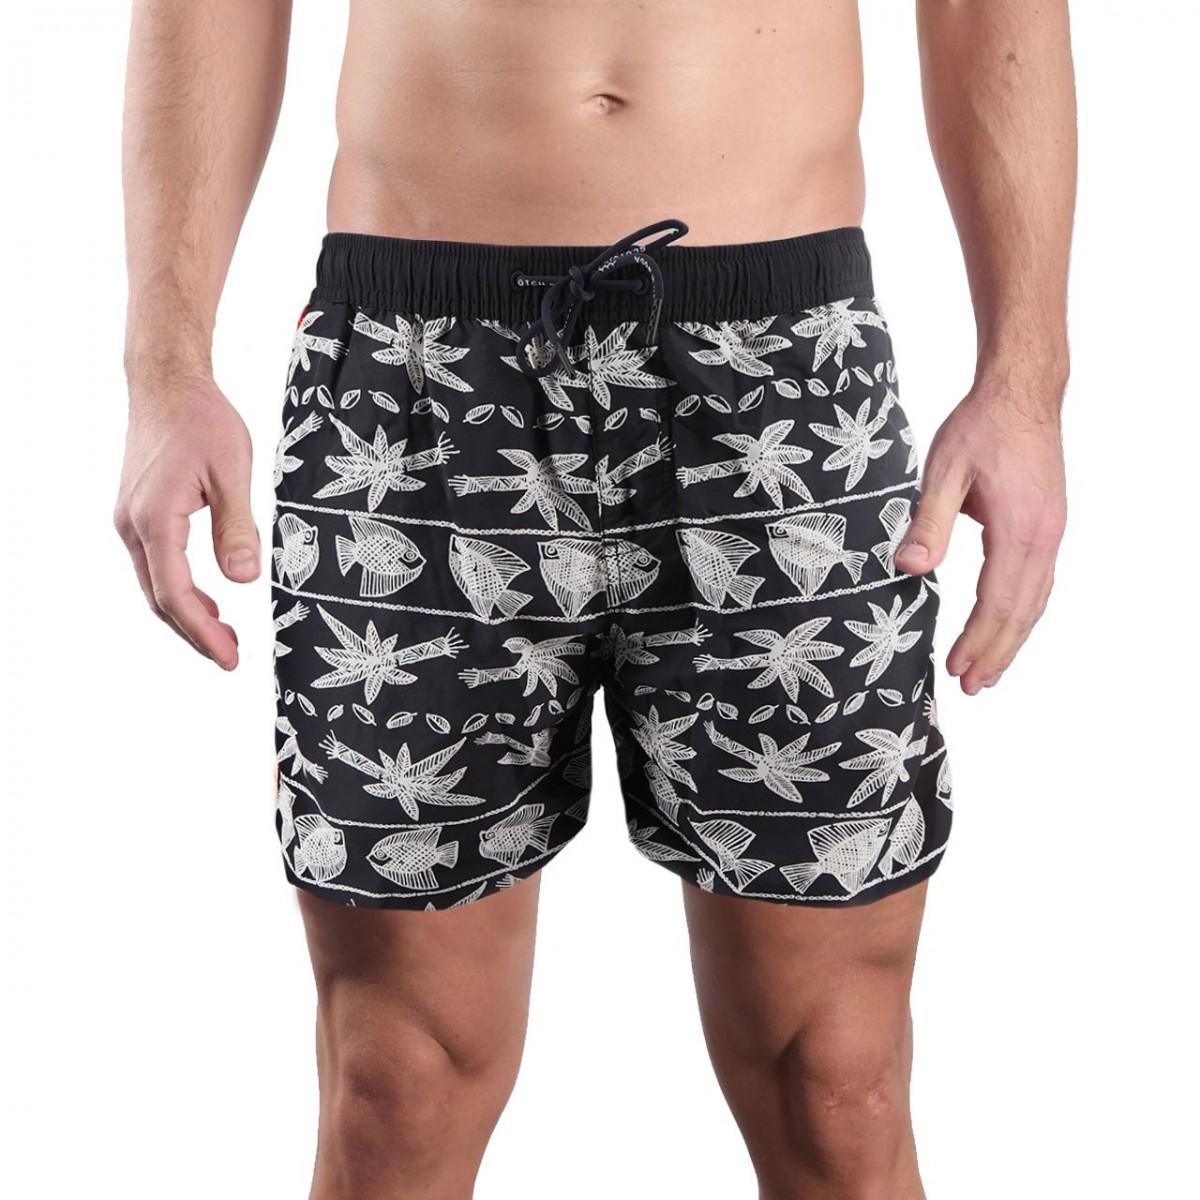 b17d3b6f1ff Black Tropical Swimsuit